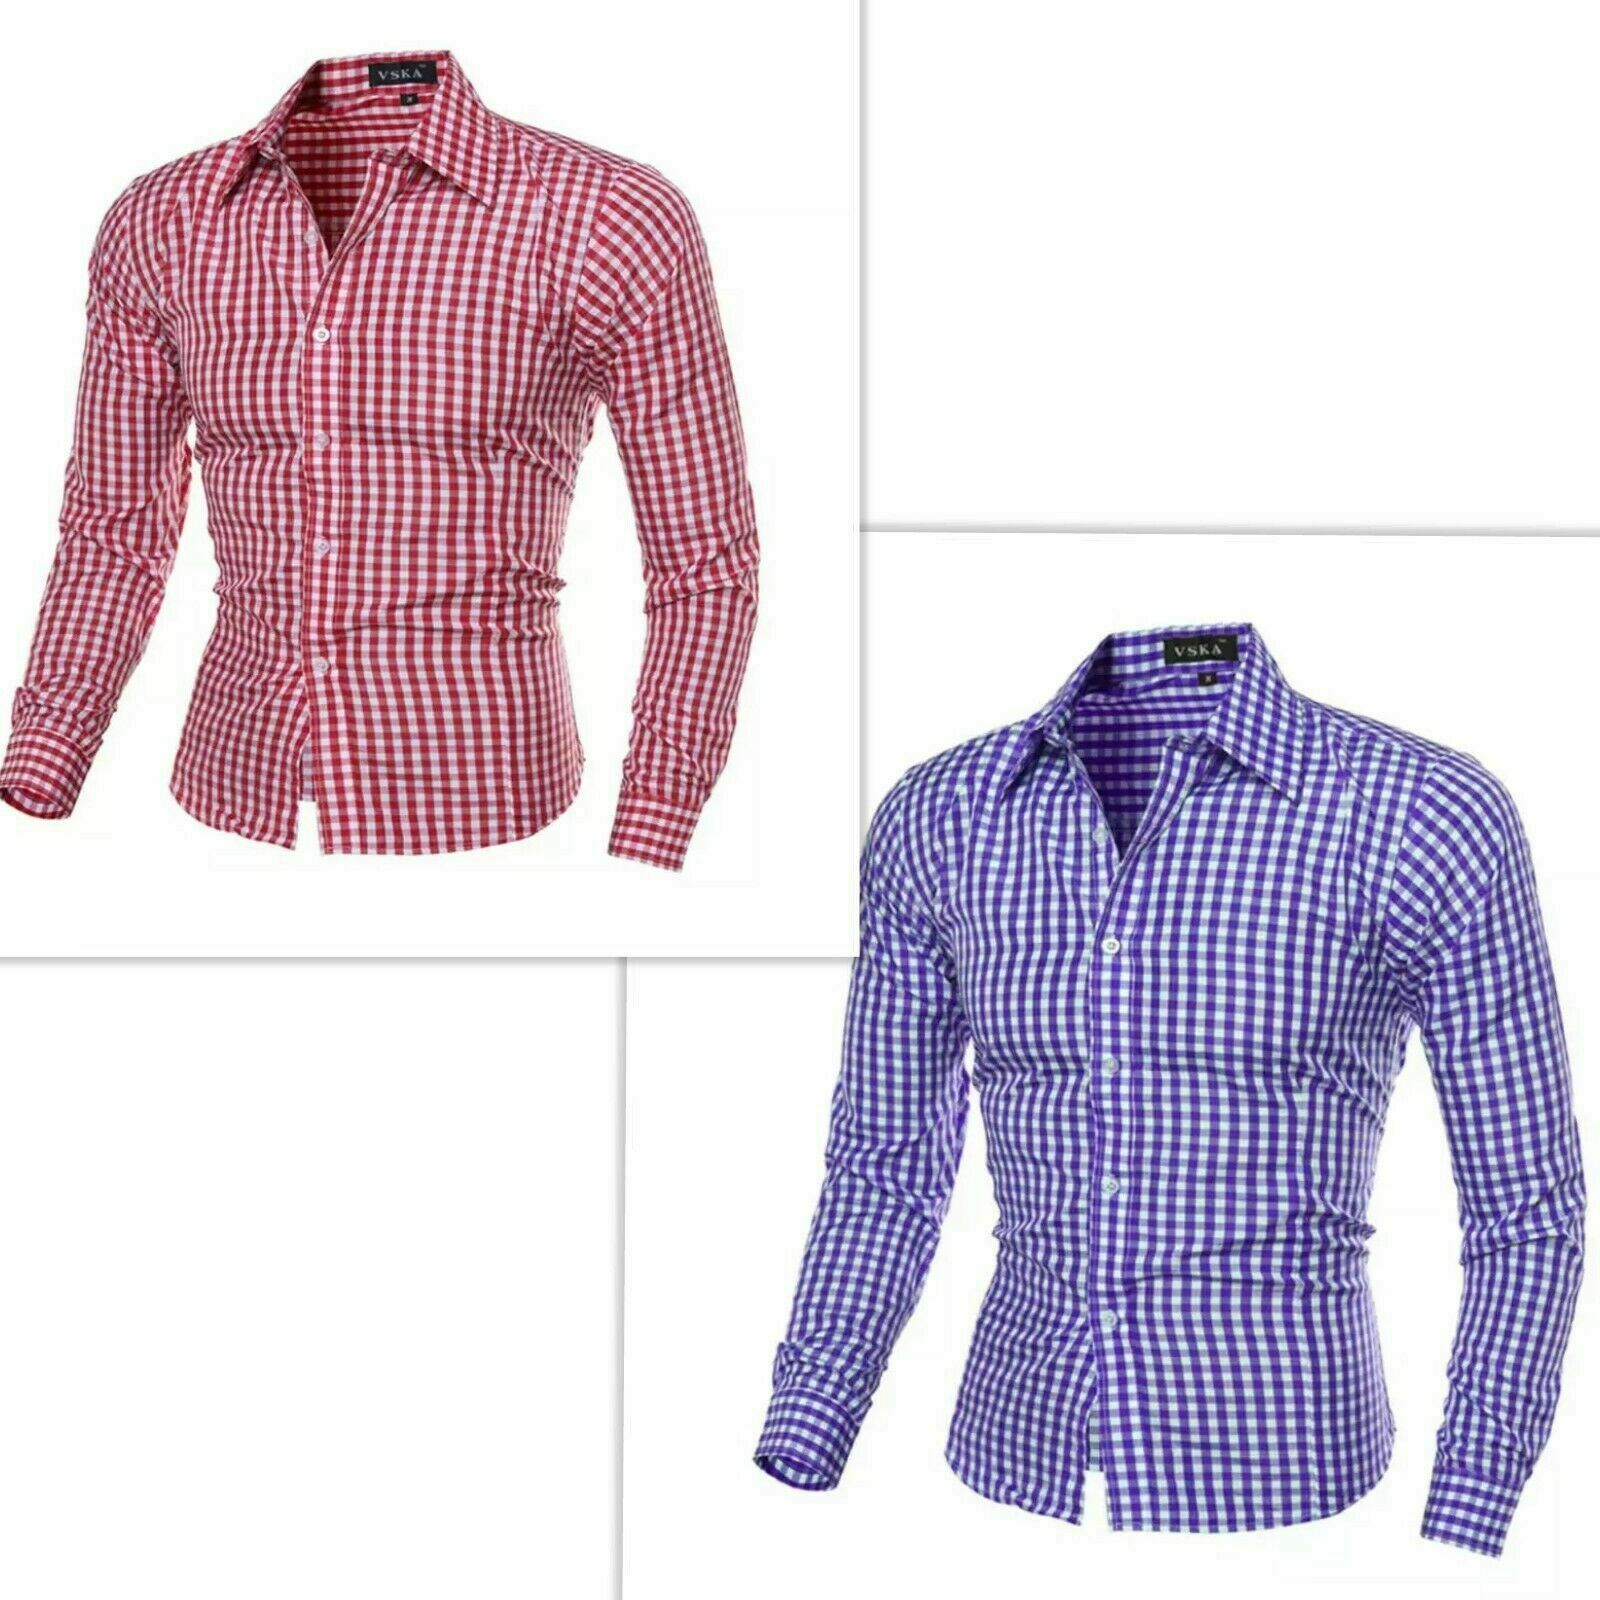 Kariertes Trachtenhemd für Trachtenlederhosen  Hemd Hemden Oktoberfest S-3XL DE